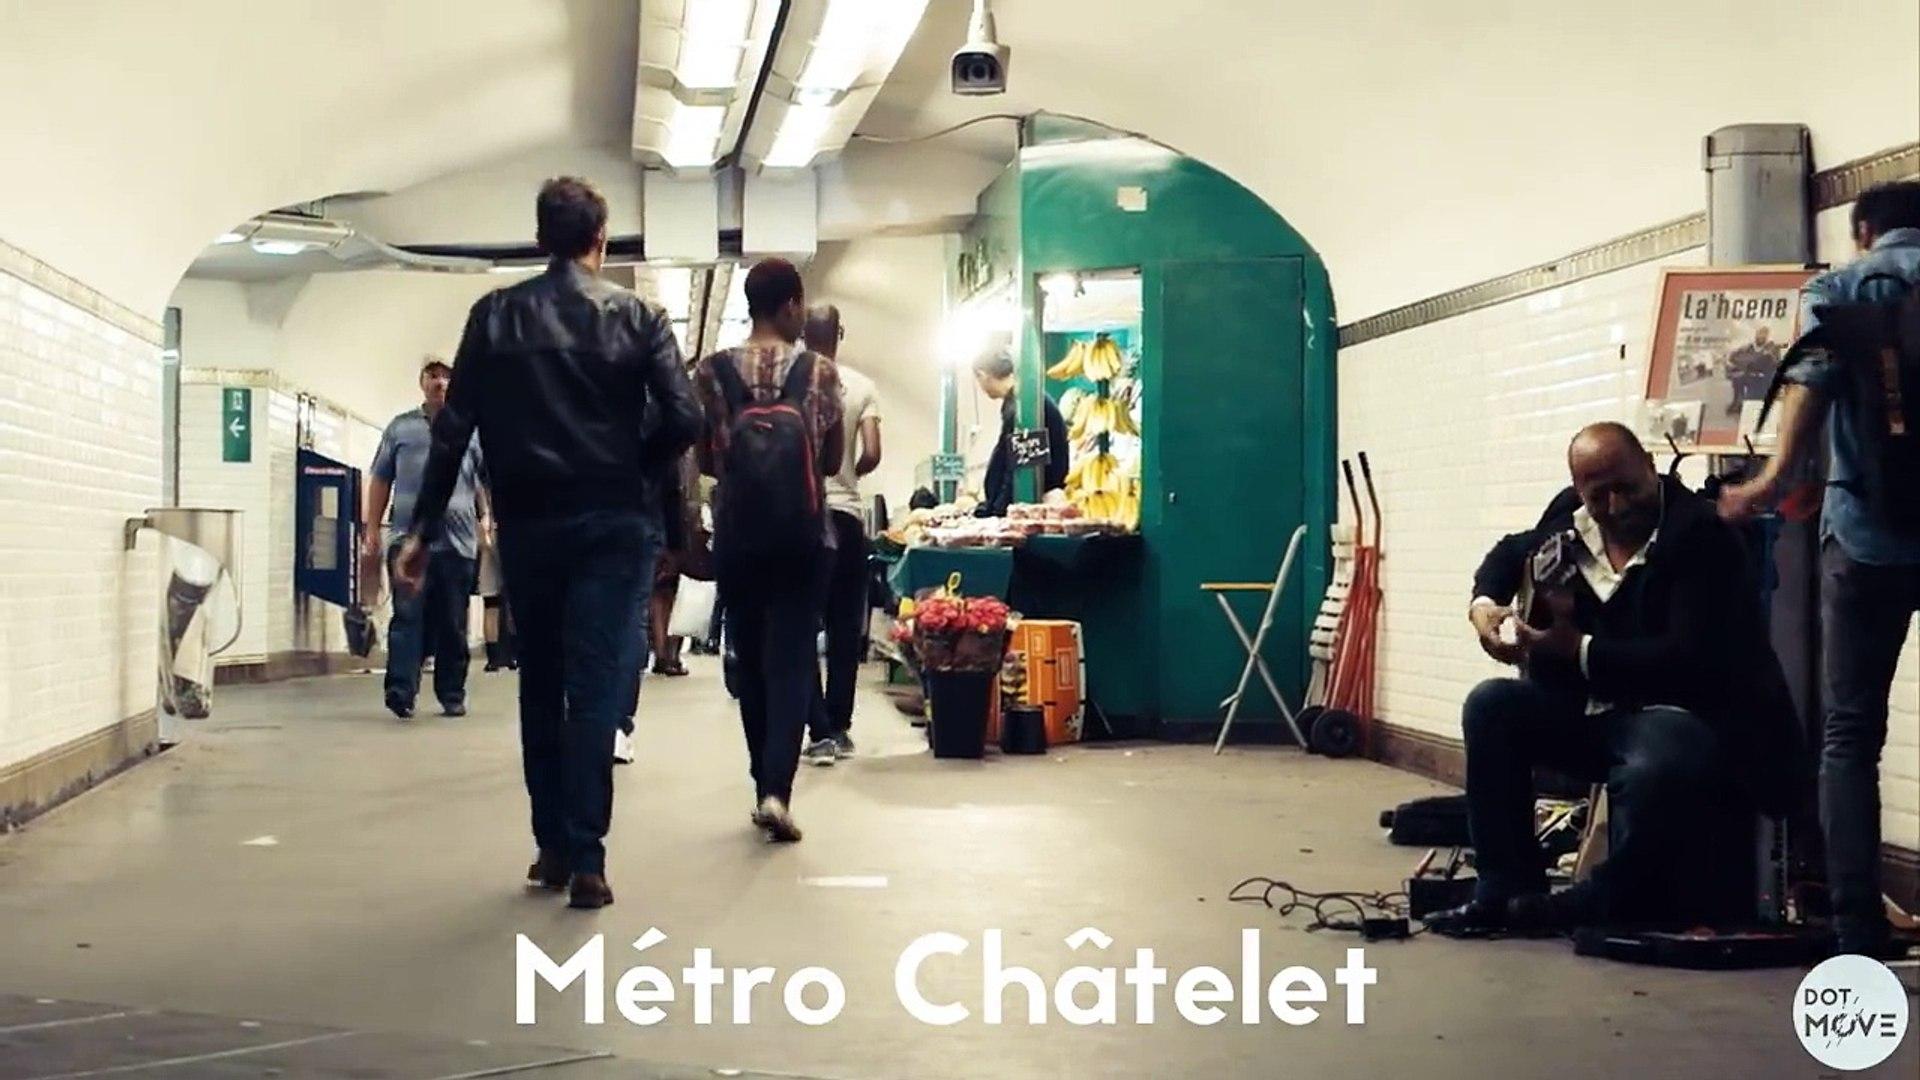 When Dancers Meet Subway Musicians in Paris